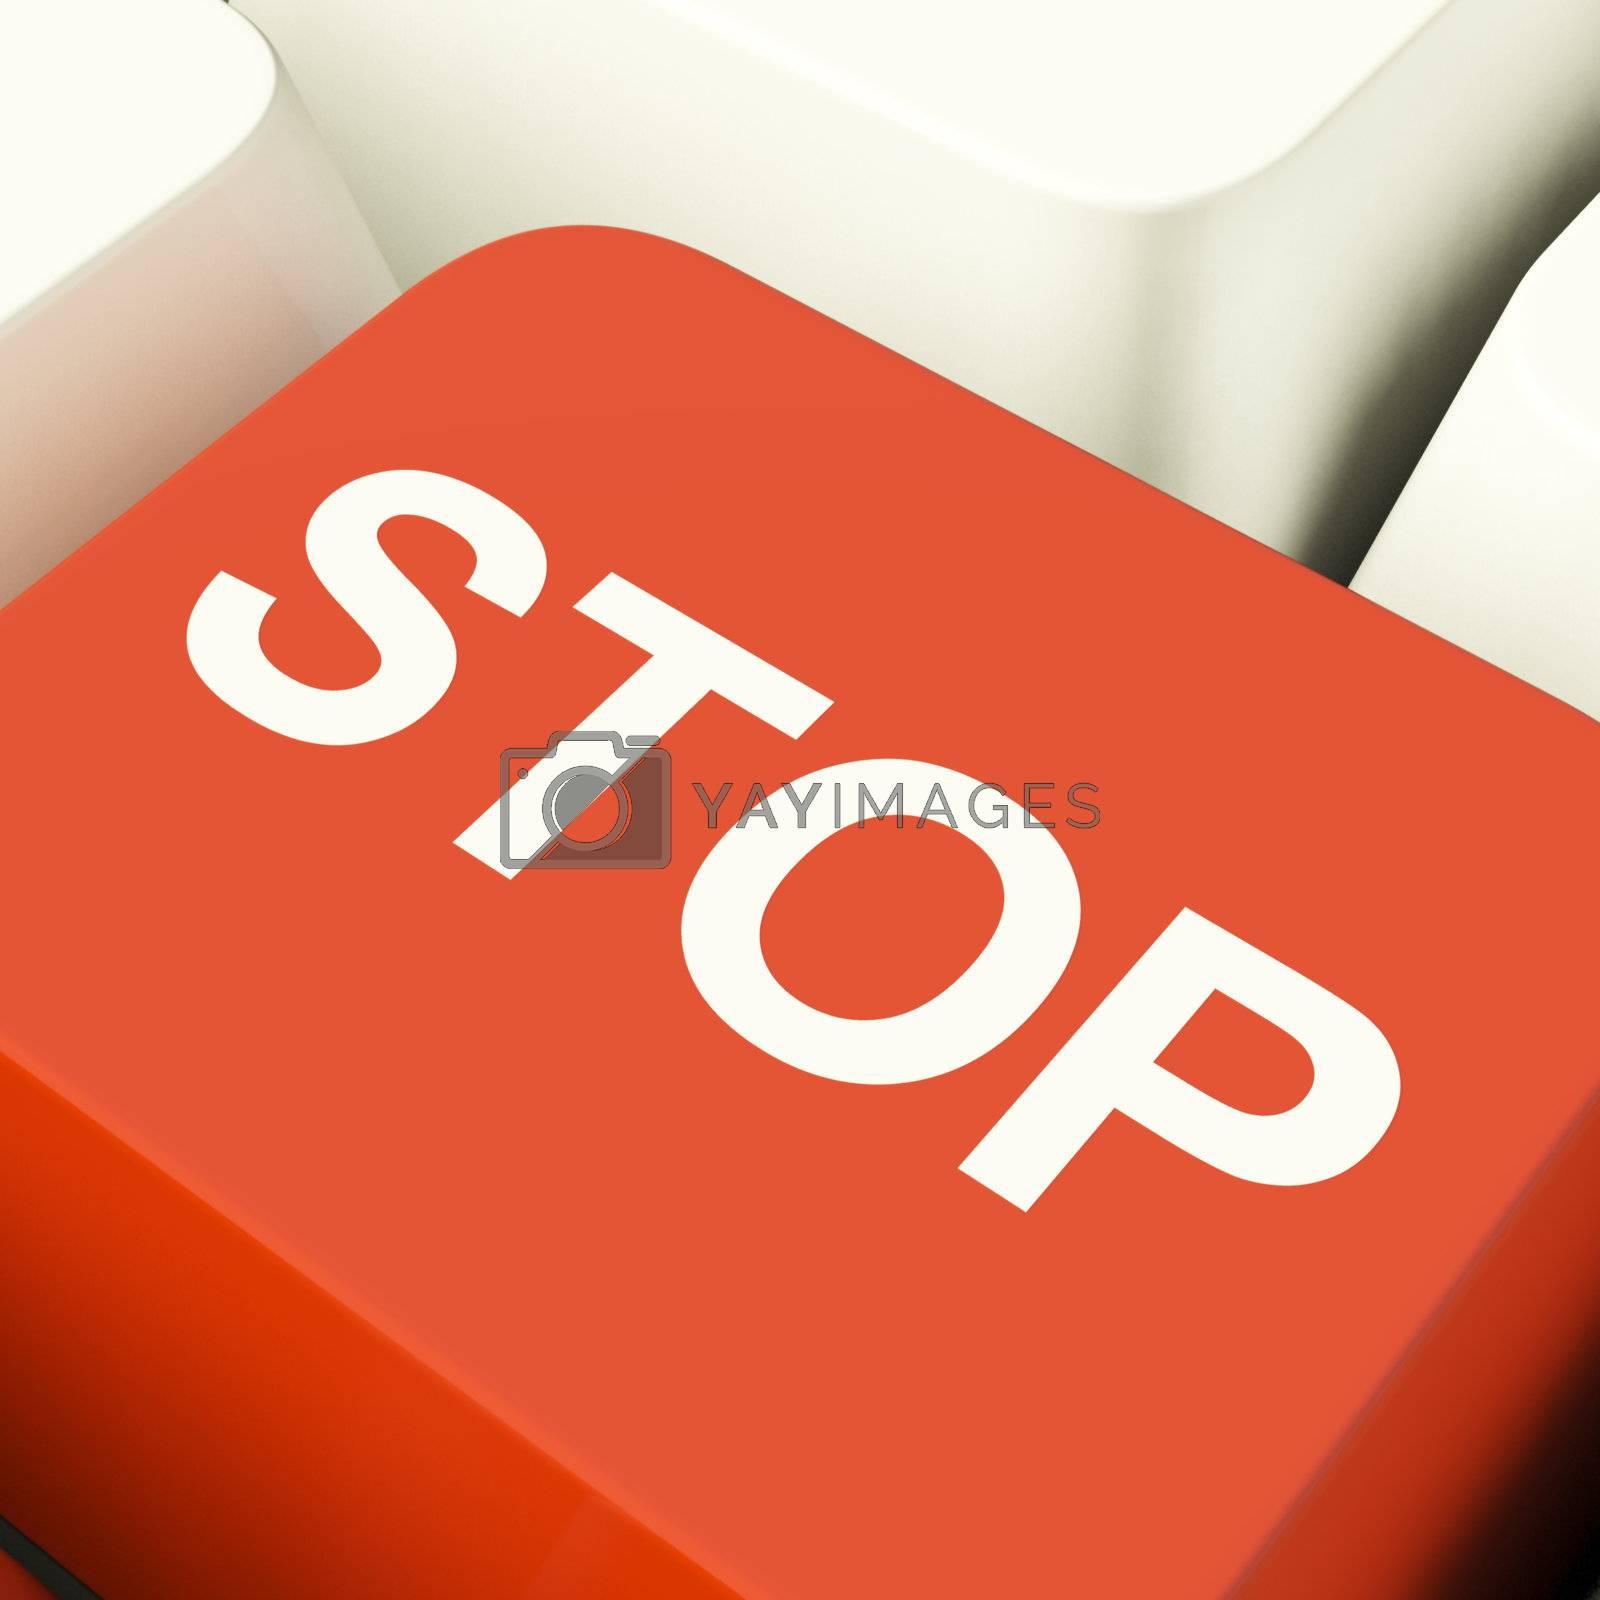 Stop Computer Key Showing Denial Panic Or Negativity